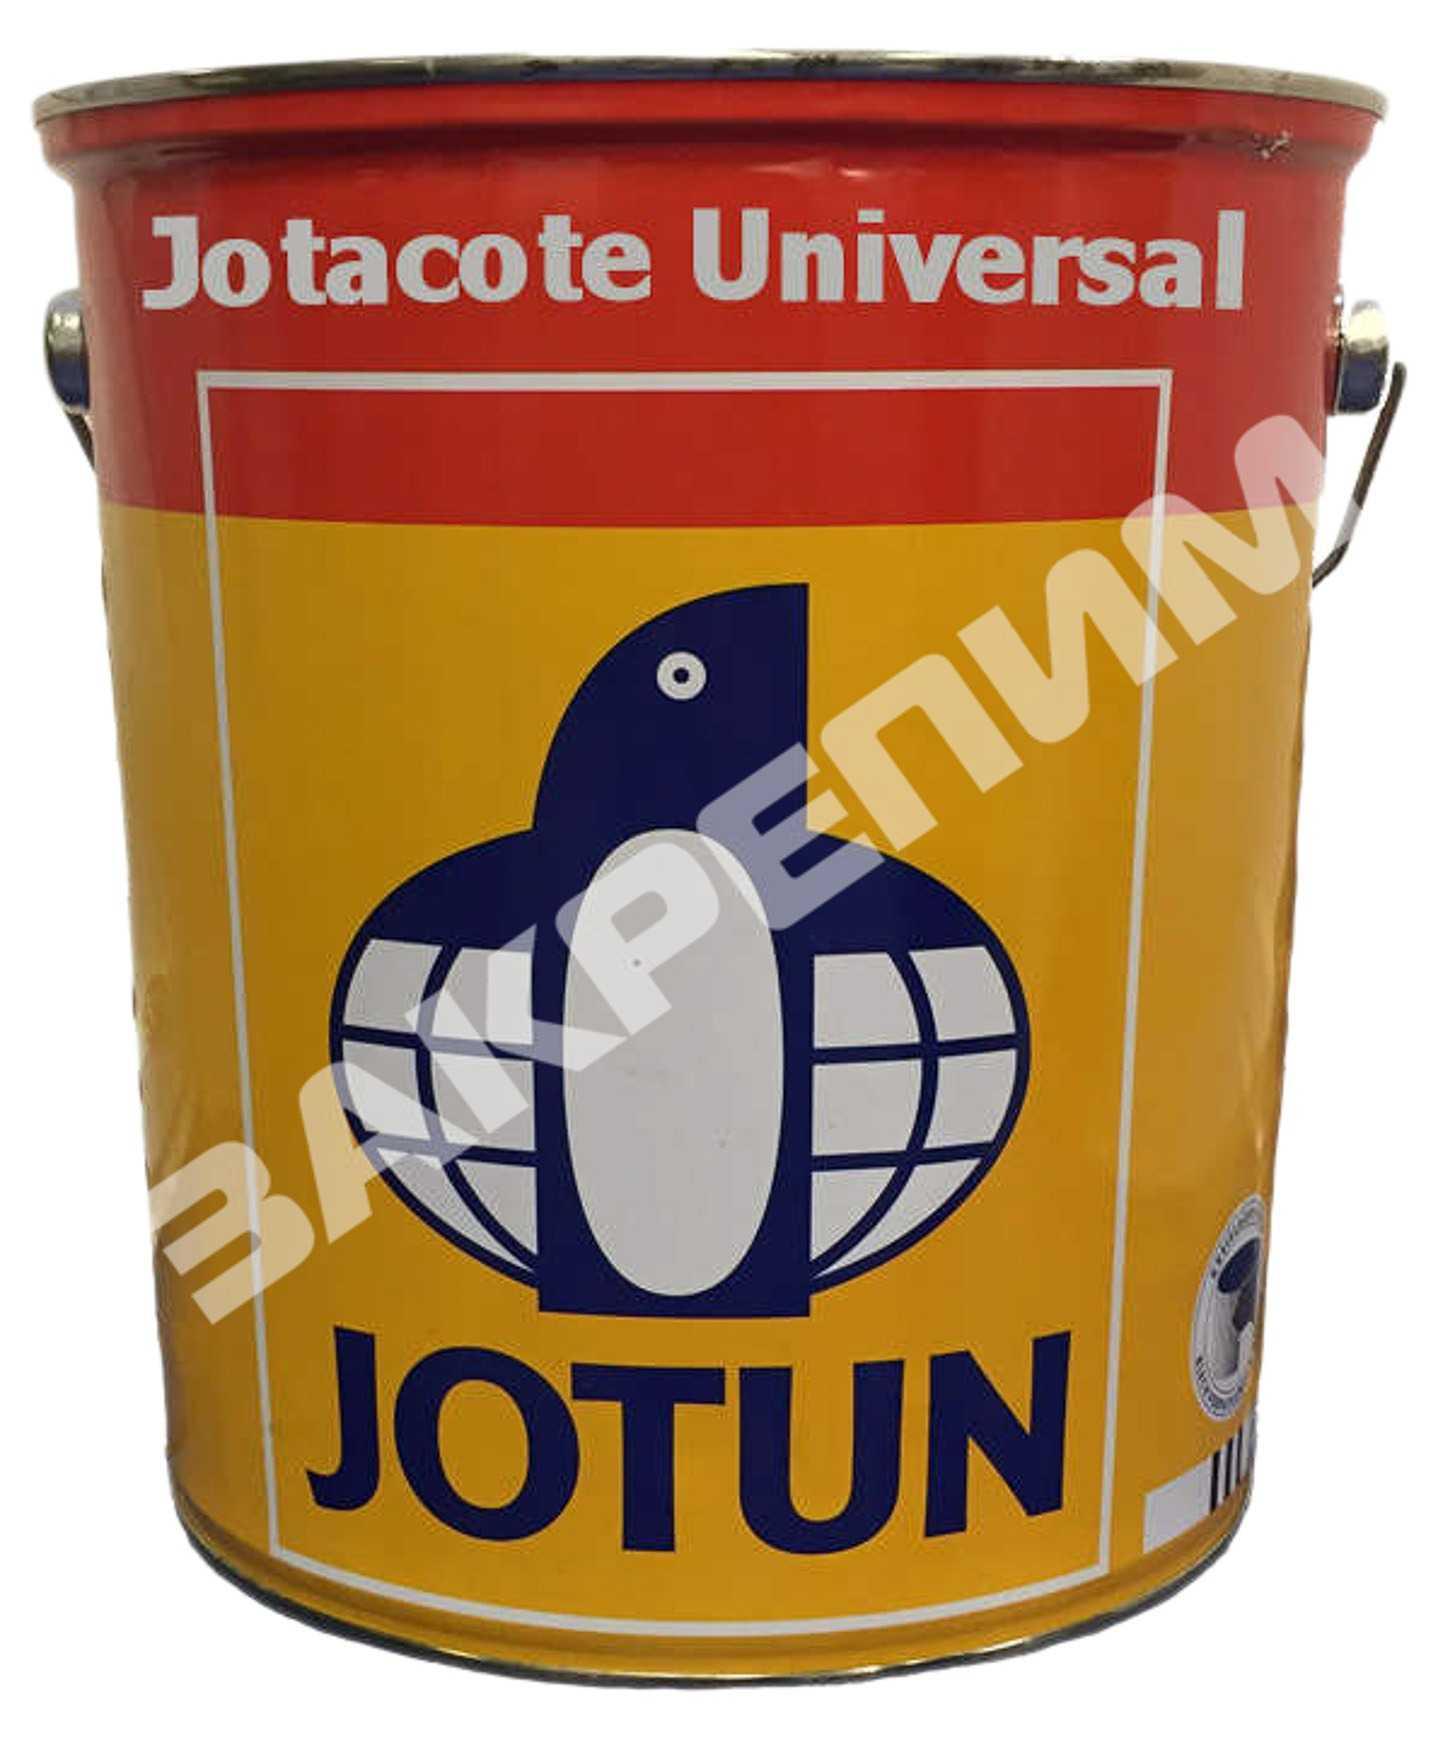 EMPSL_Jotacote_Universal